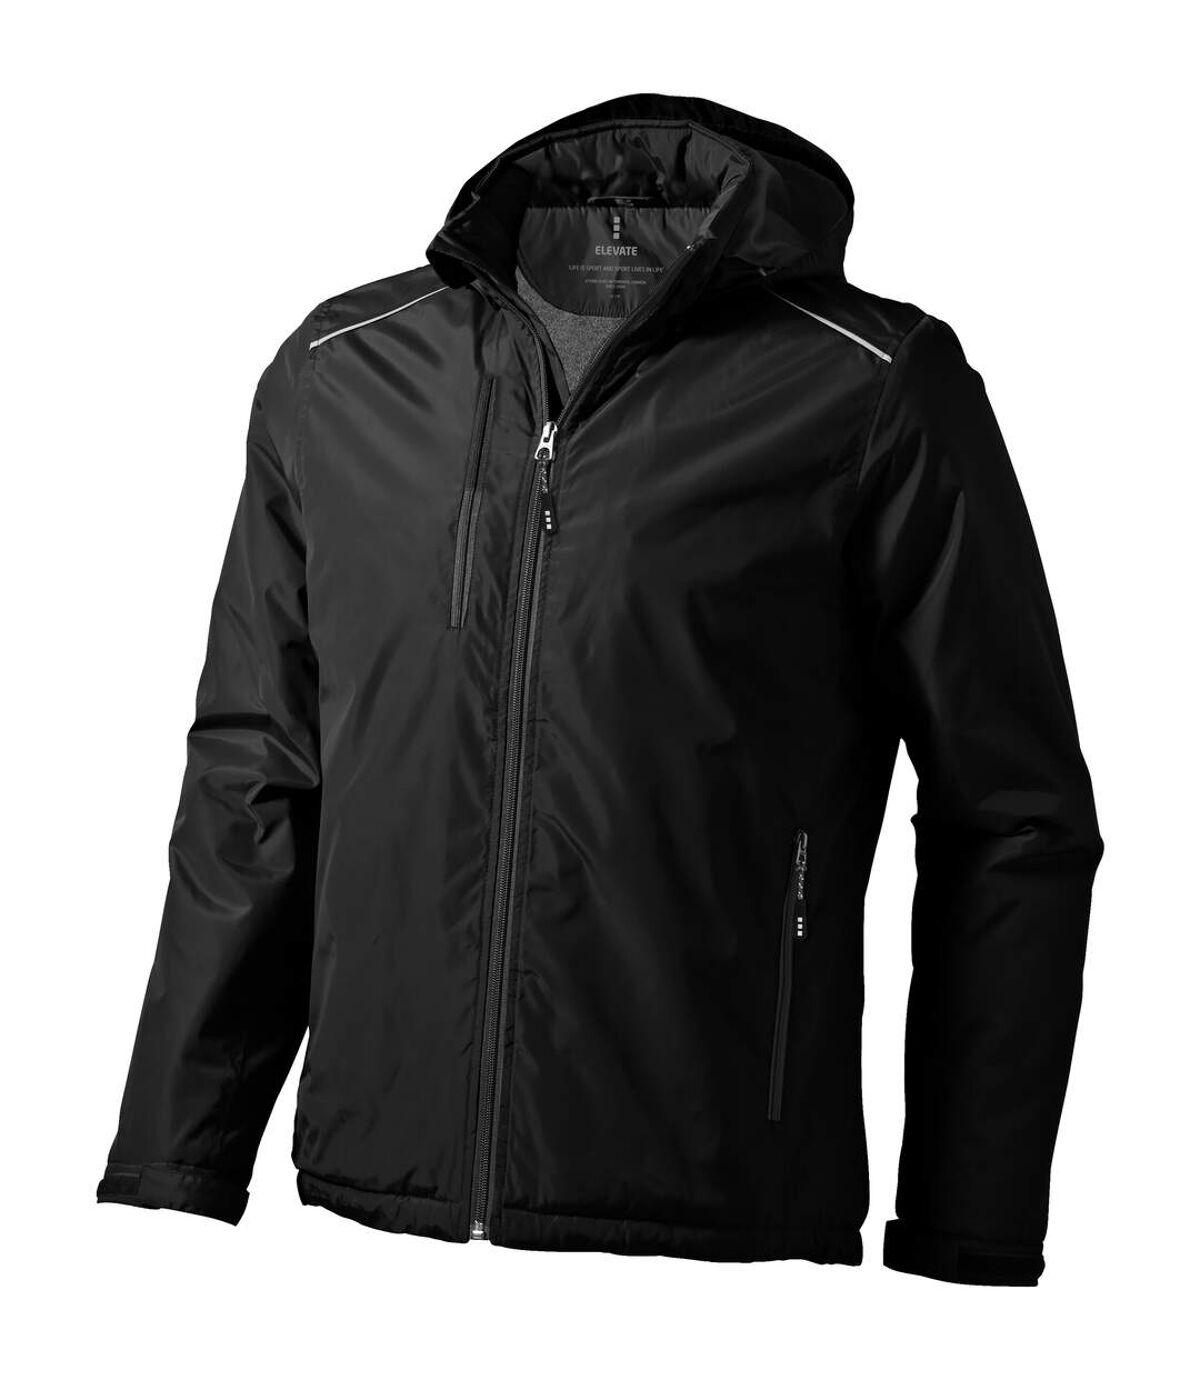 Elevate Mens Smithers Fleece Lined Jacket (Solid Black) - UTPF1909